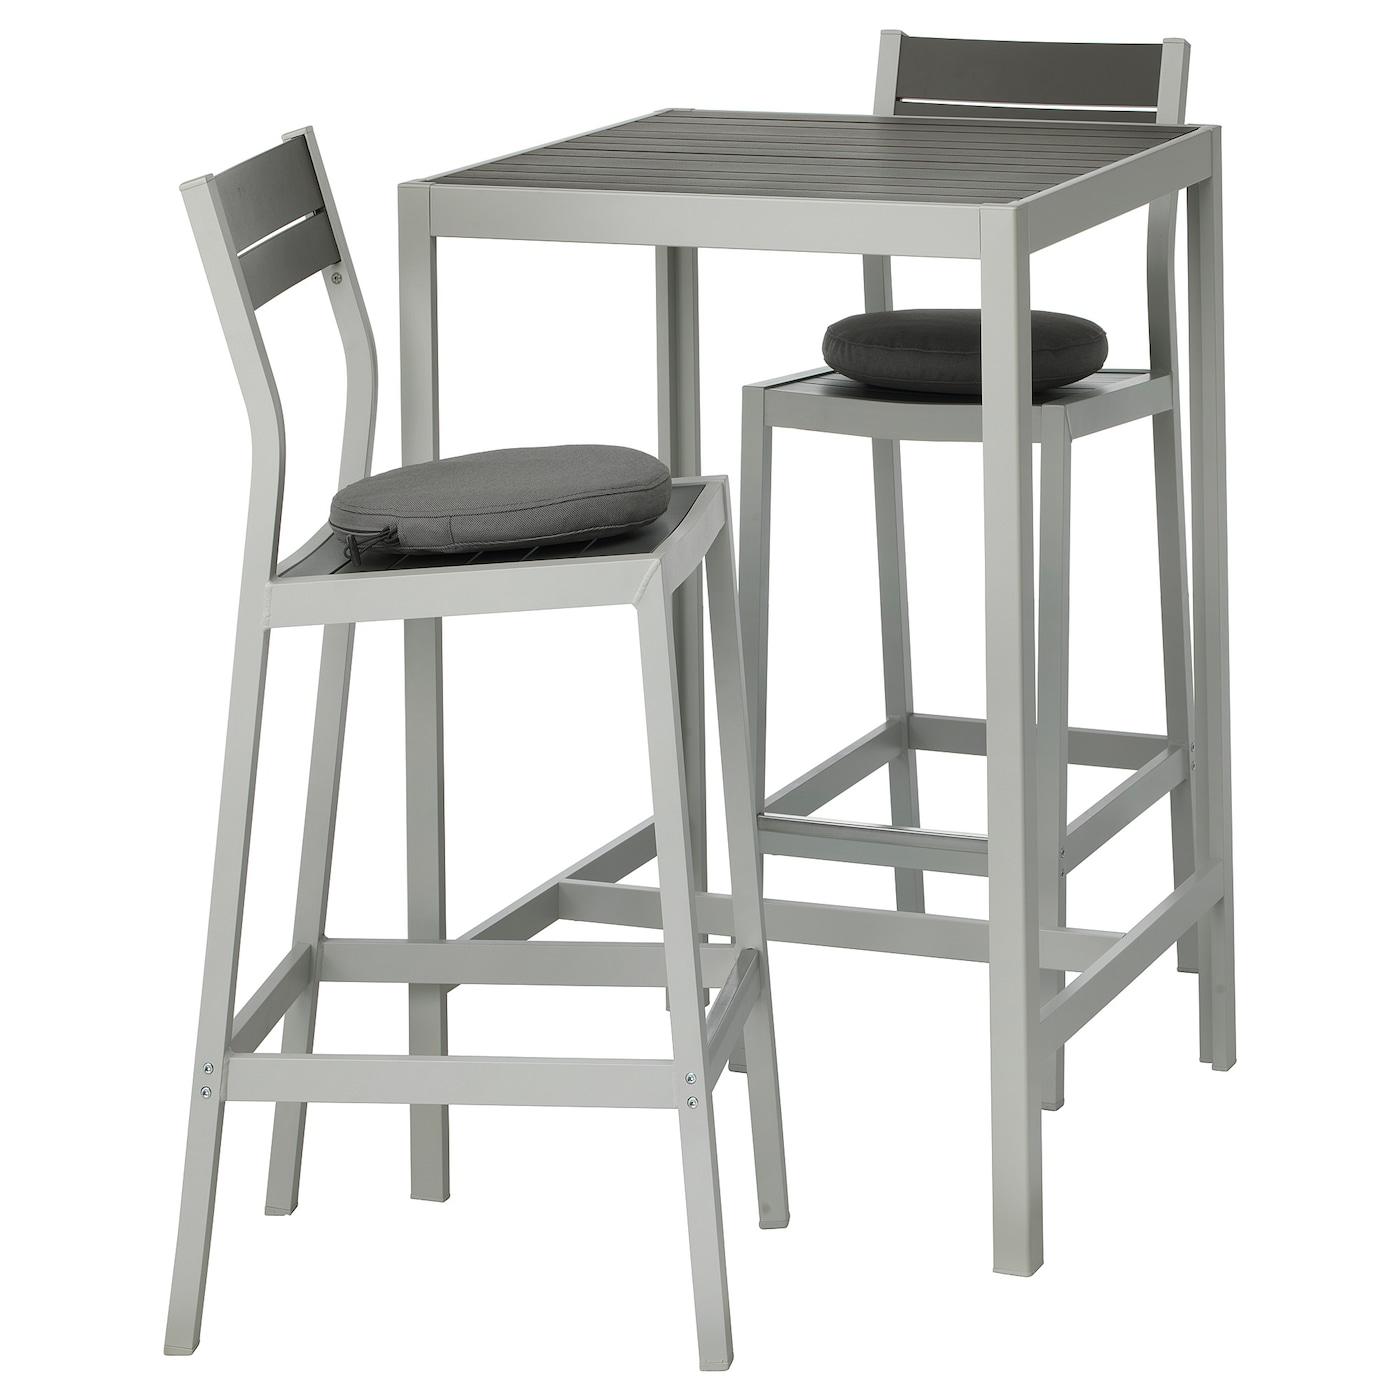 Incroyable SJÄLLAND Bar Table And 2 Bar Stools, Outdoor, Dark Gray, Frösön/Duvholmen  Beige